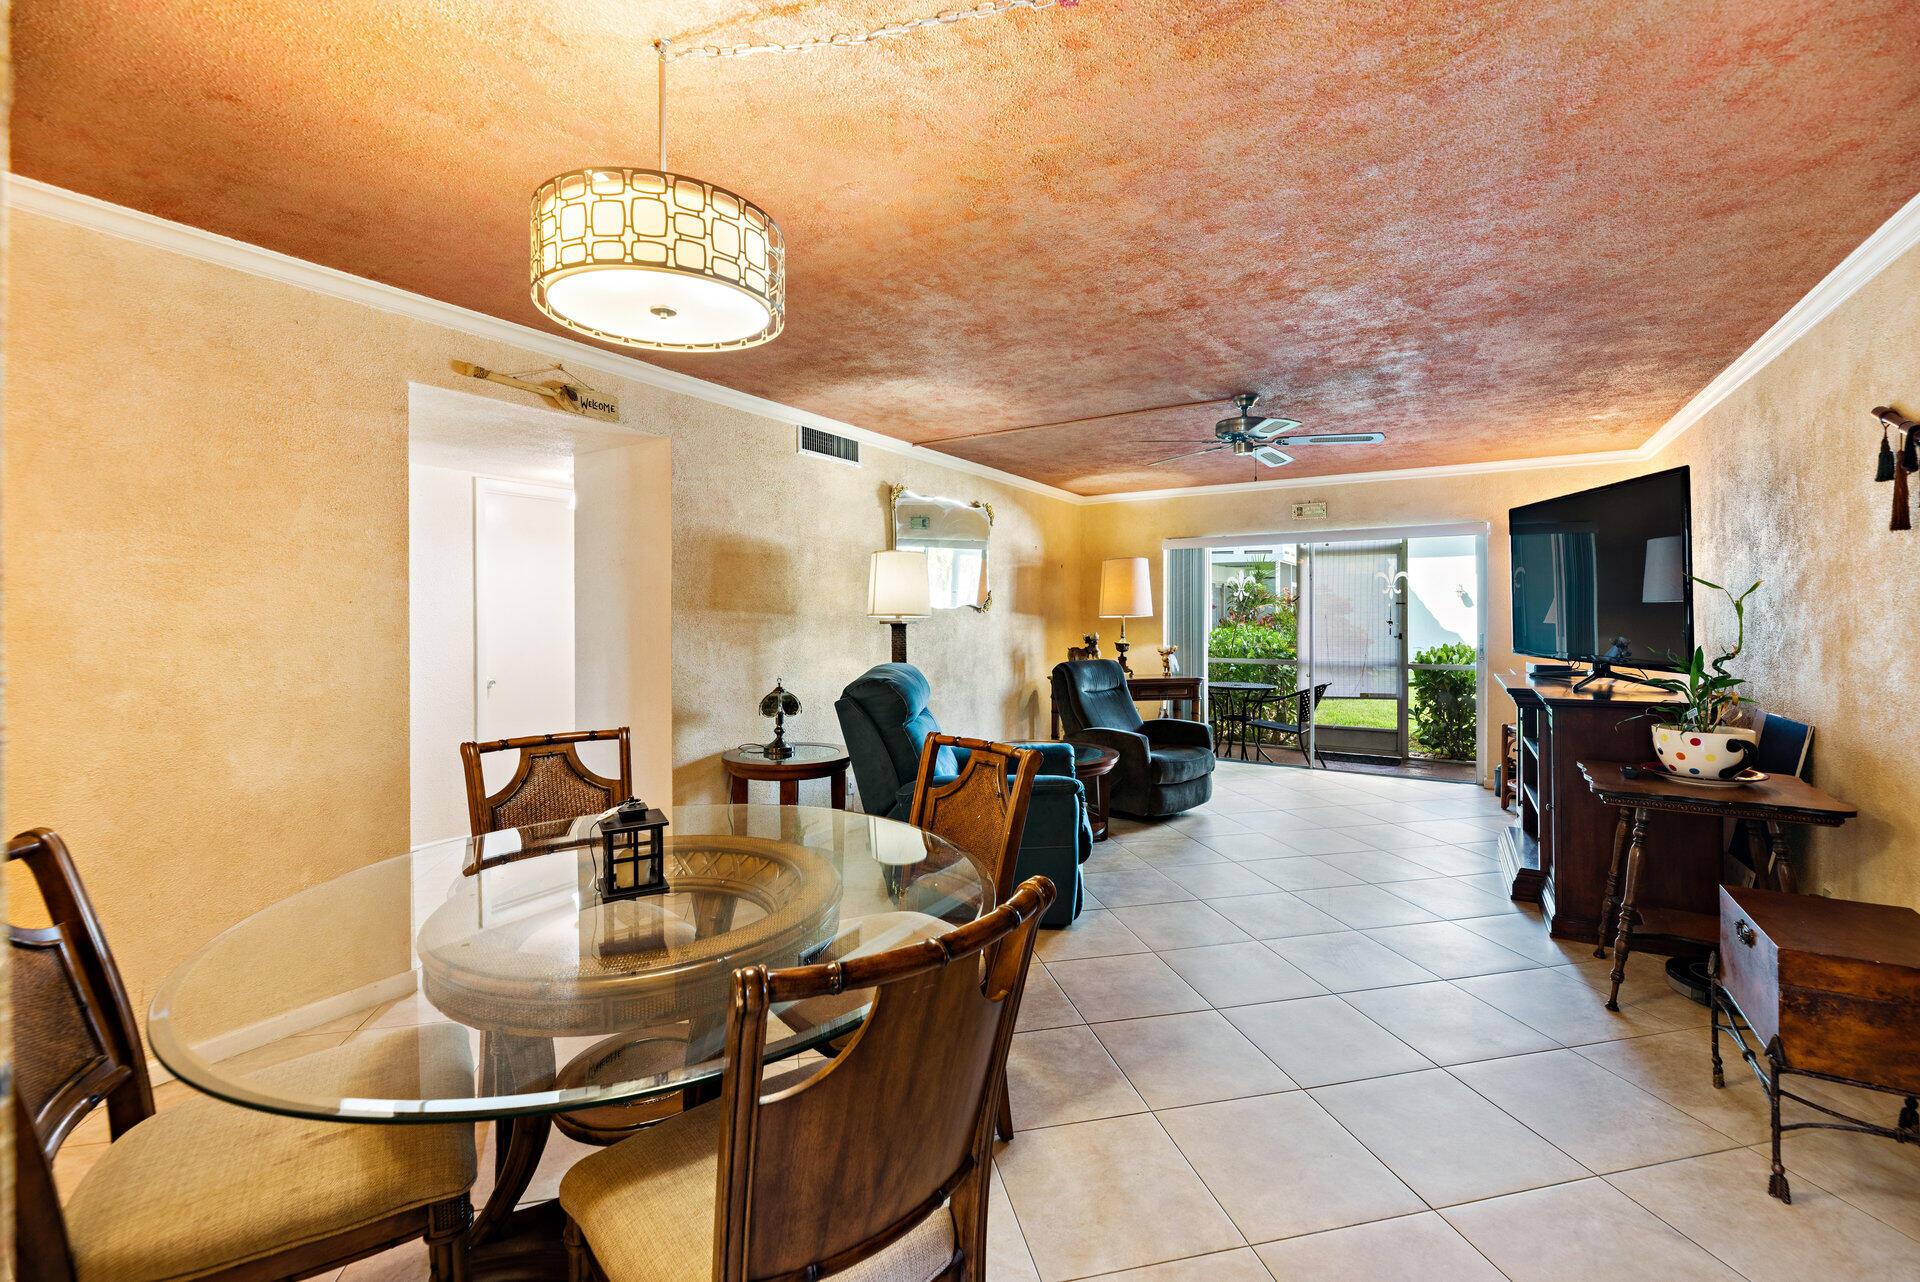 Home for sale in Riverhouse Gardens Deerfield Beach Florida